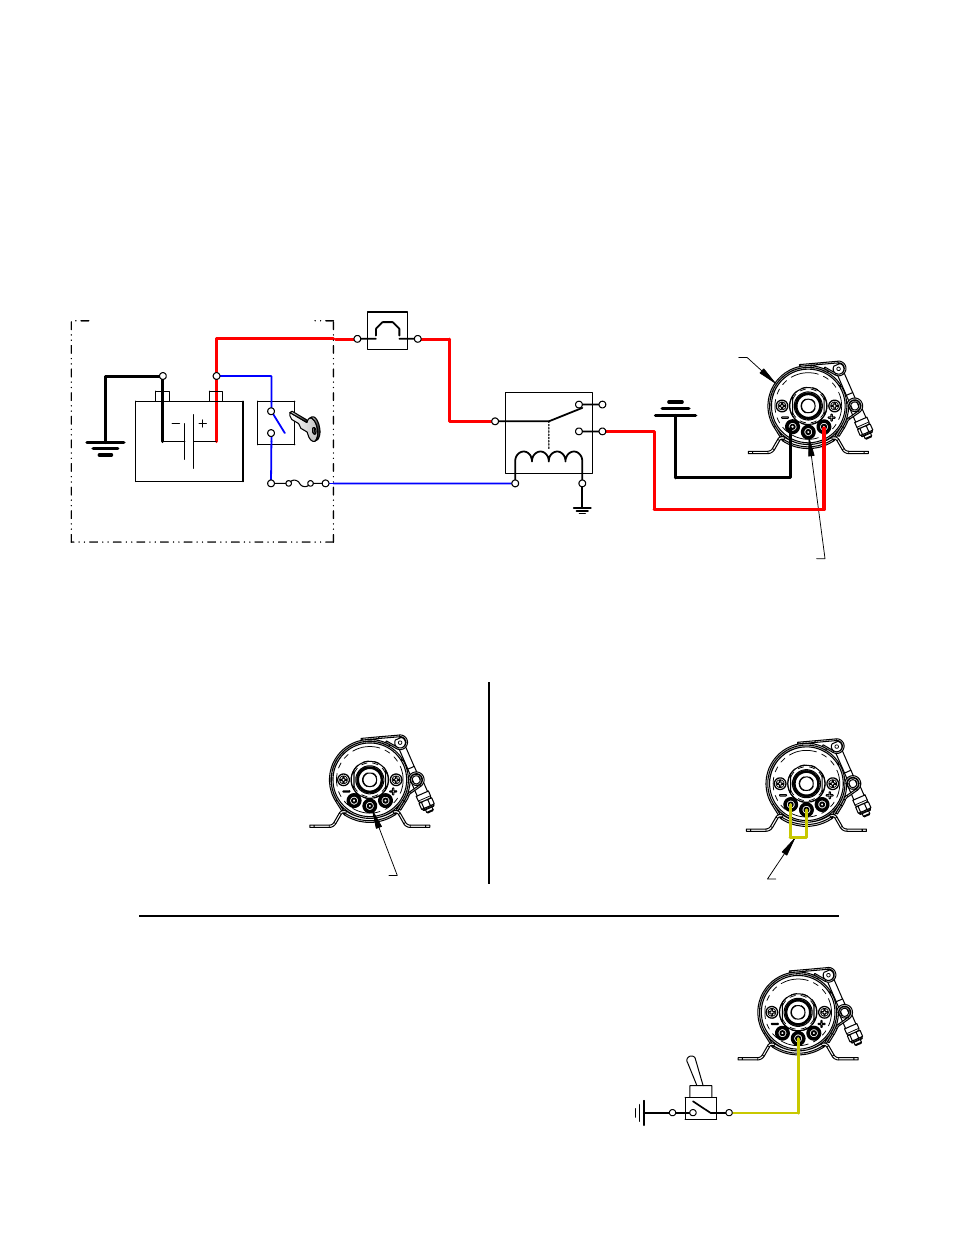 Modern Rb25det Wiring Diagram Model - Electrical System Block ...